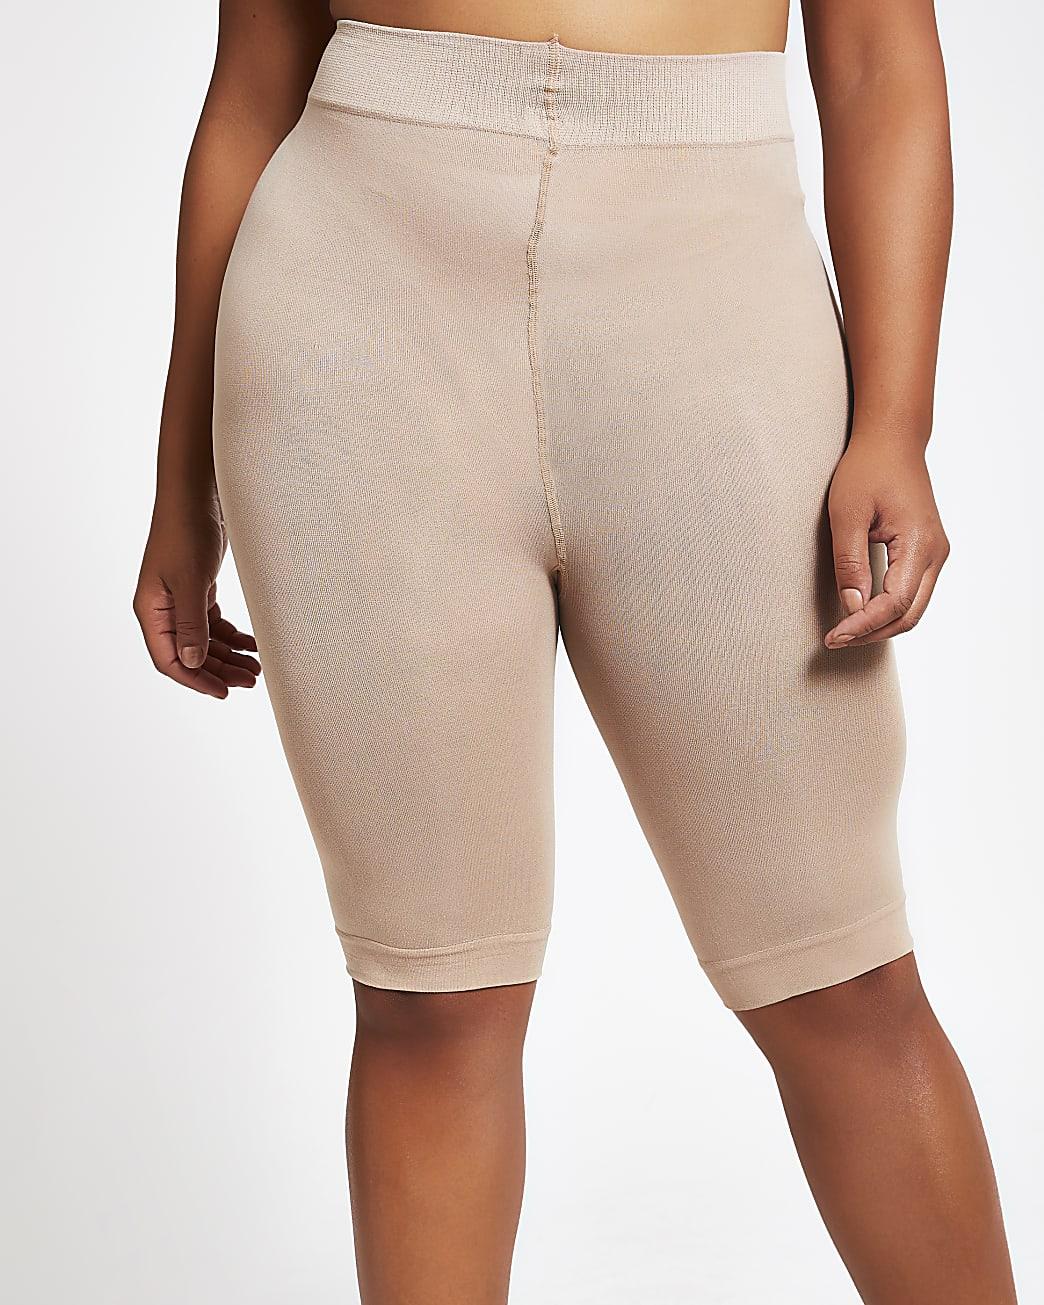 Beige 90 denier plus size anti chafing shorts